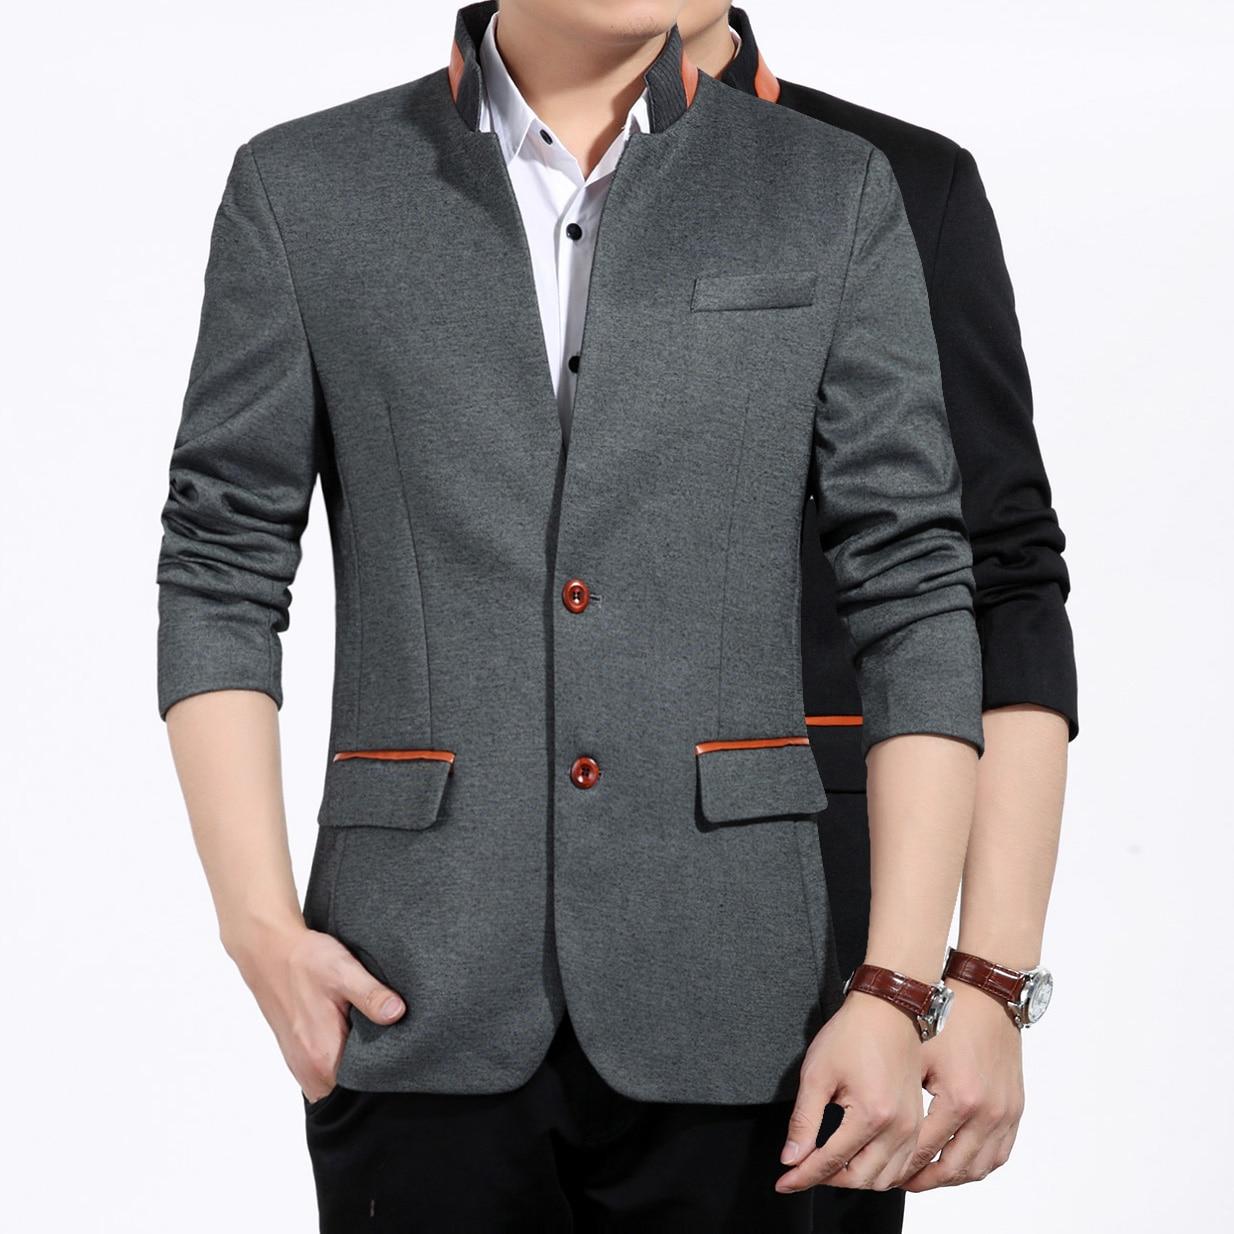 Men's jacket collar - 2016 New Arrival Fashion Leather Stand Collar Blazer Men Slim Fit Blazer Jacket Men Plus Size